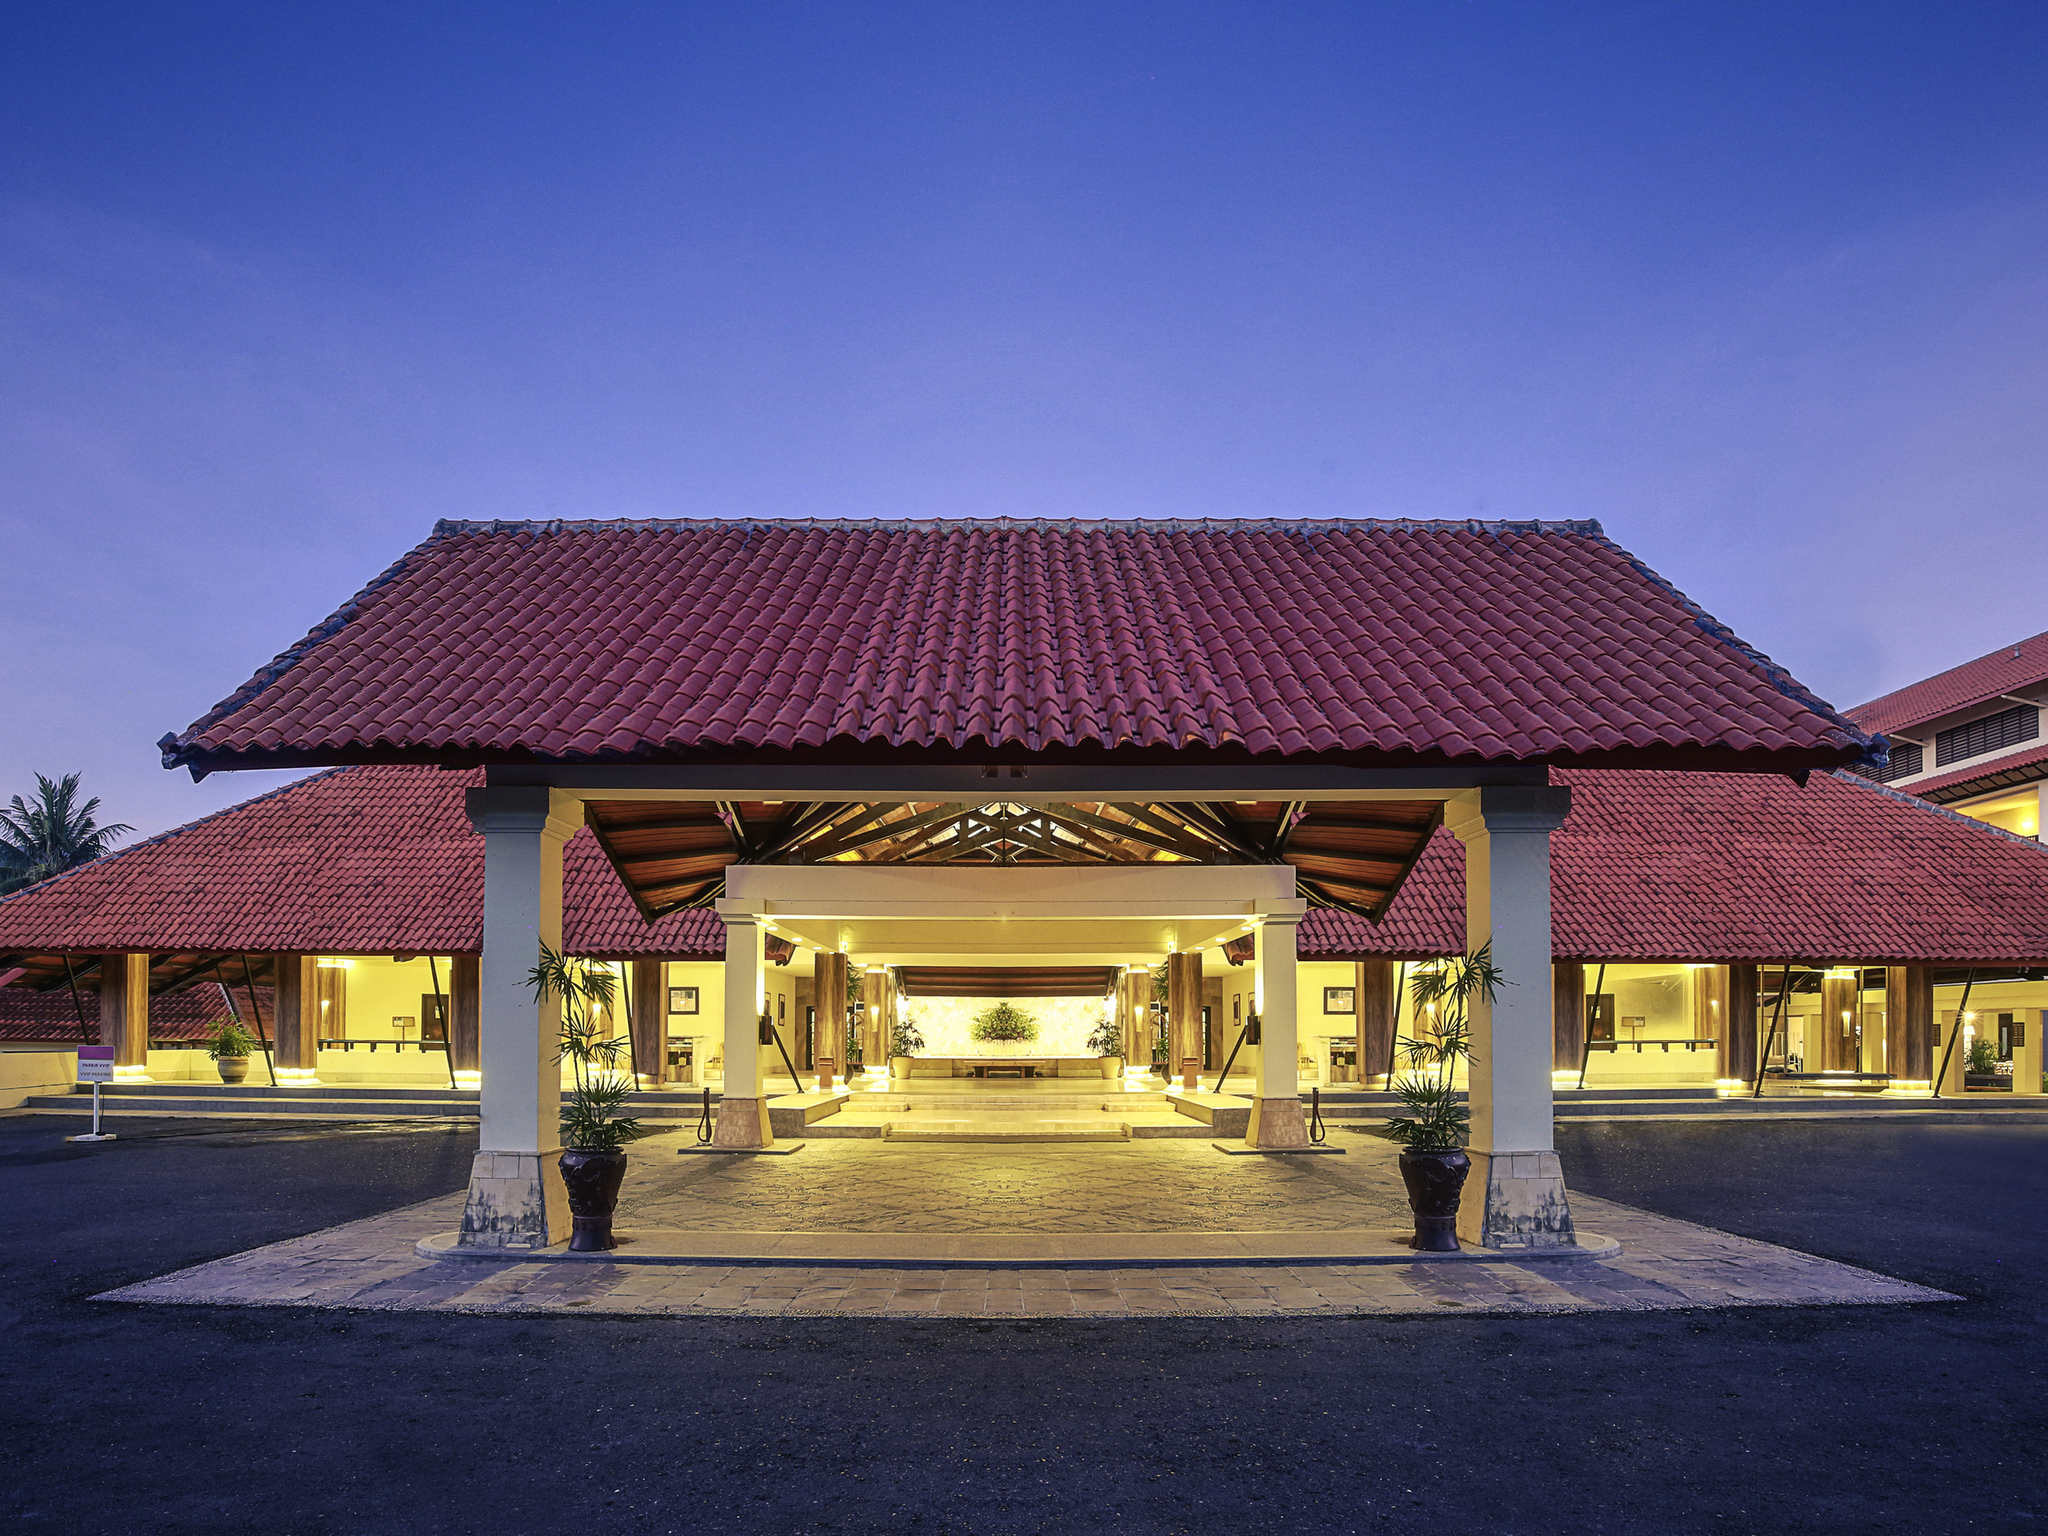 Отель — Курорт и конференц-центр Mercure Манадо Татели